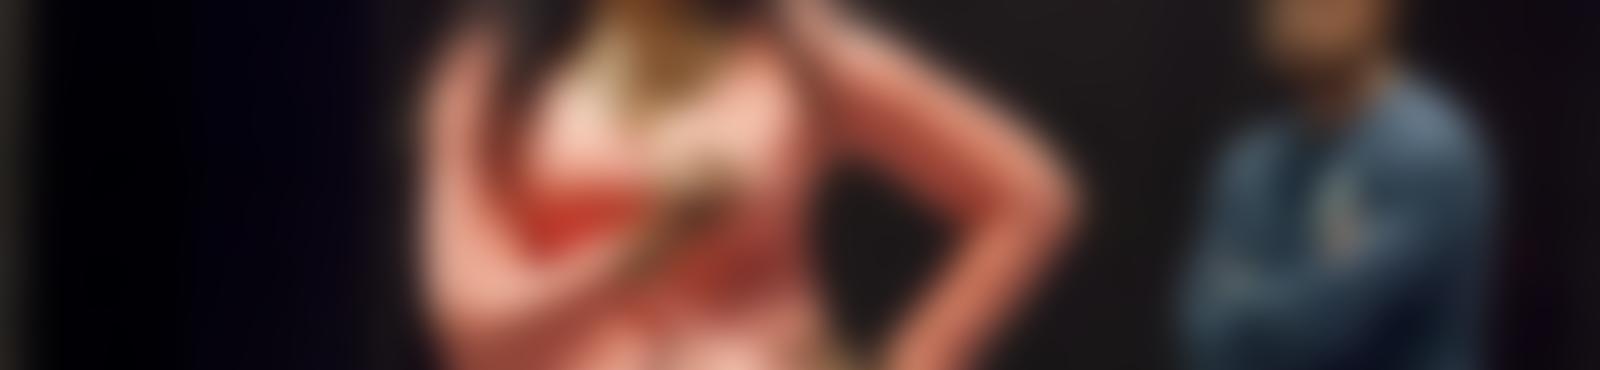 Blurred 8cc54fde 2bdd 4881 bf0a de85703ede3e